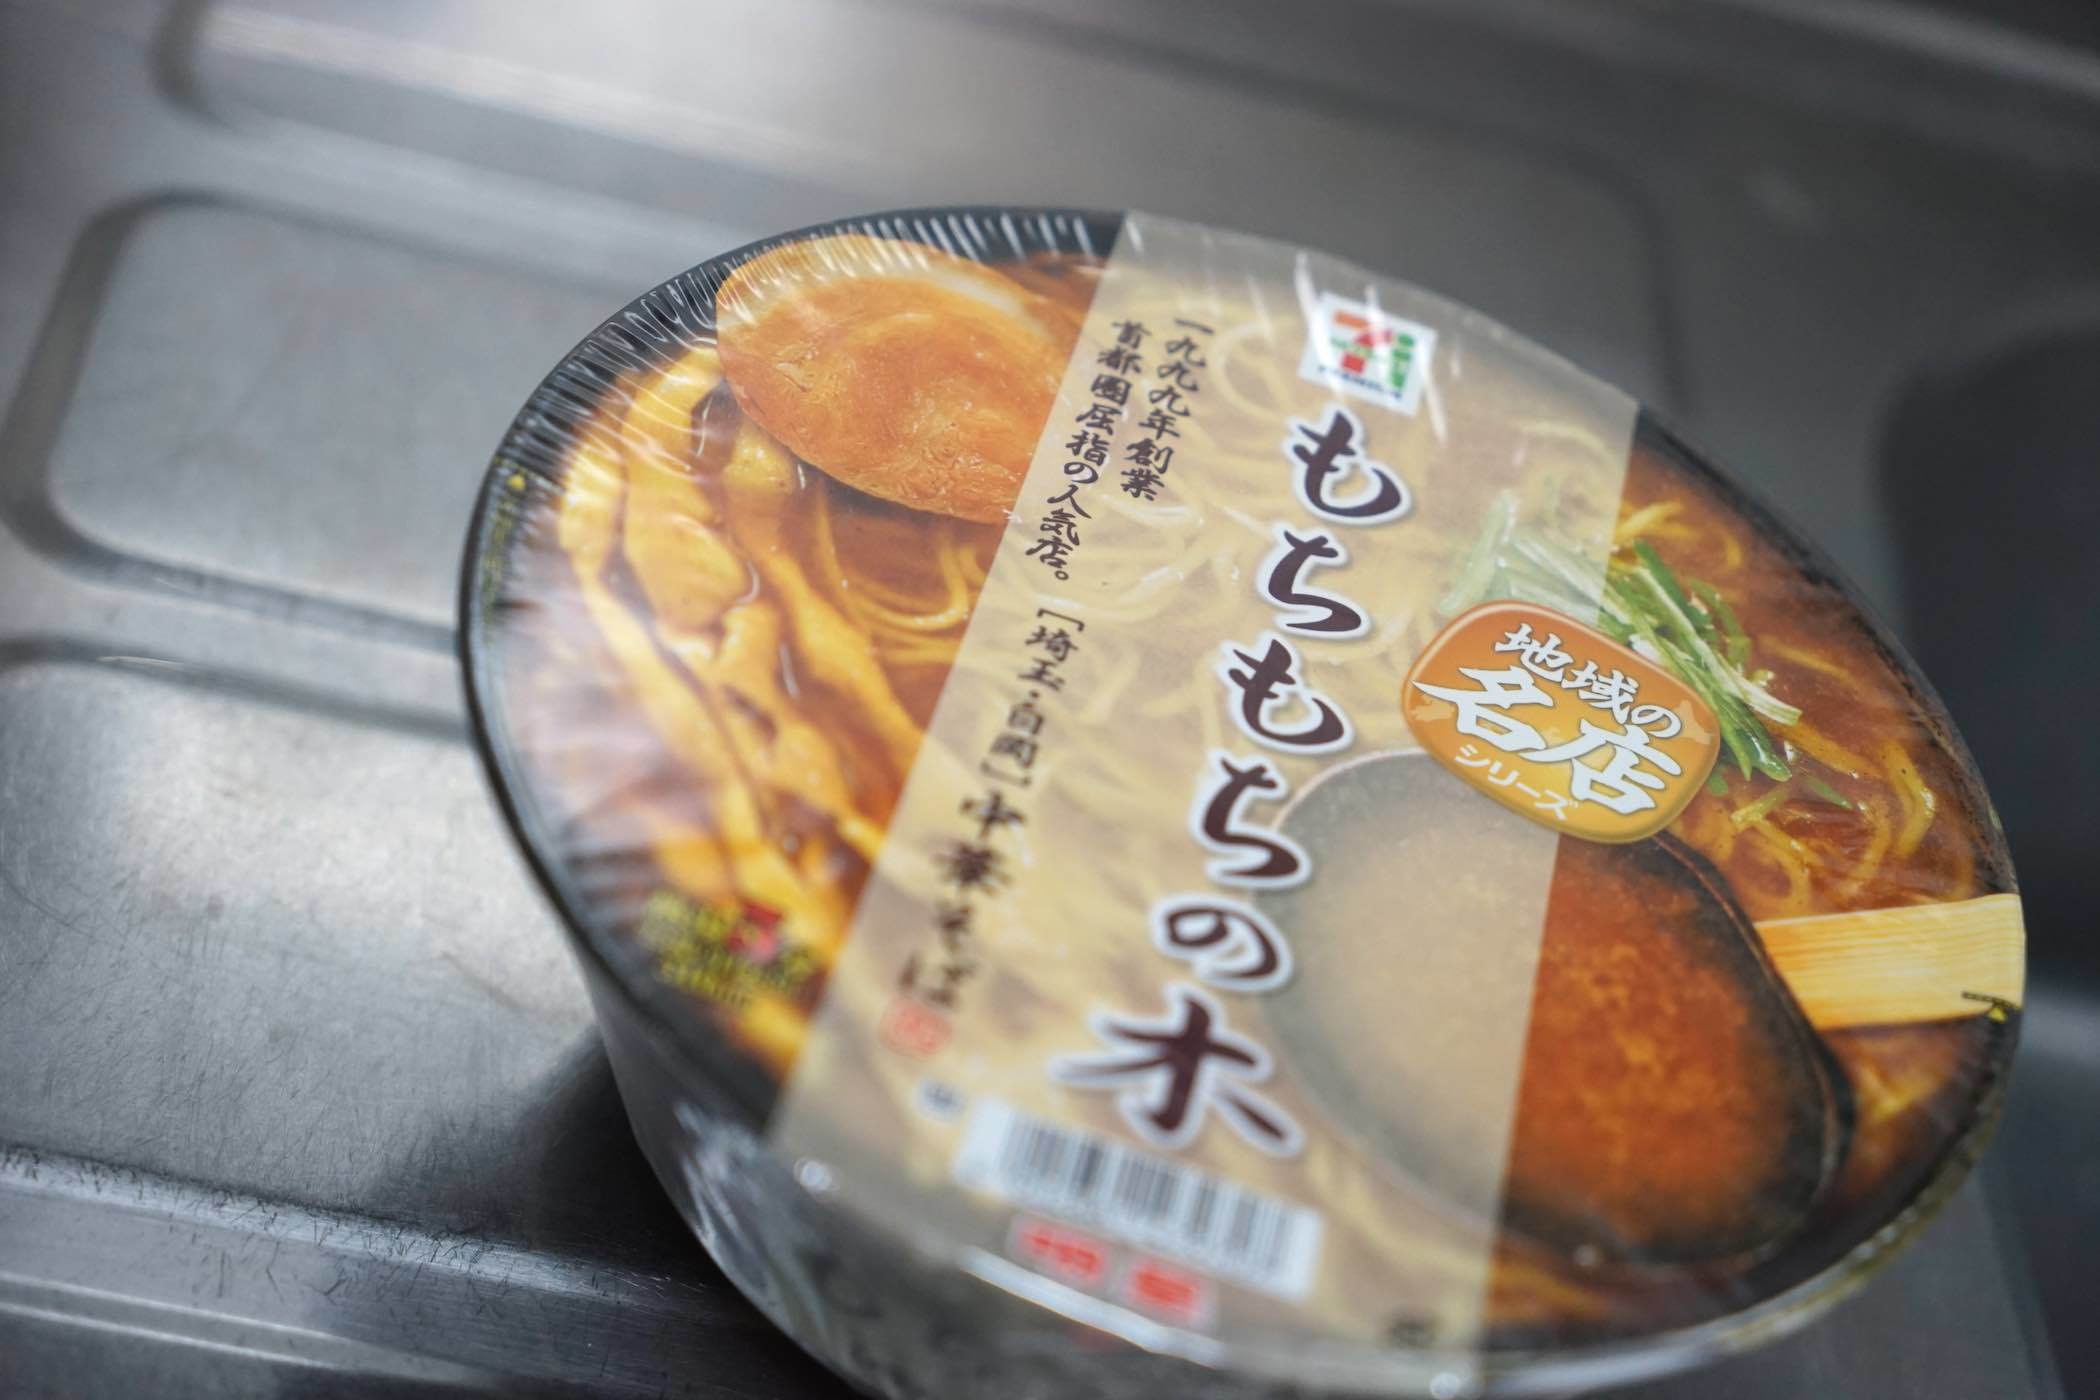 SEPもちもちの木、ラ王魚介豚骨醤油、TOKYO特濃魚介とんこつ_b0360240_22040355.jpg